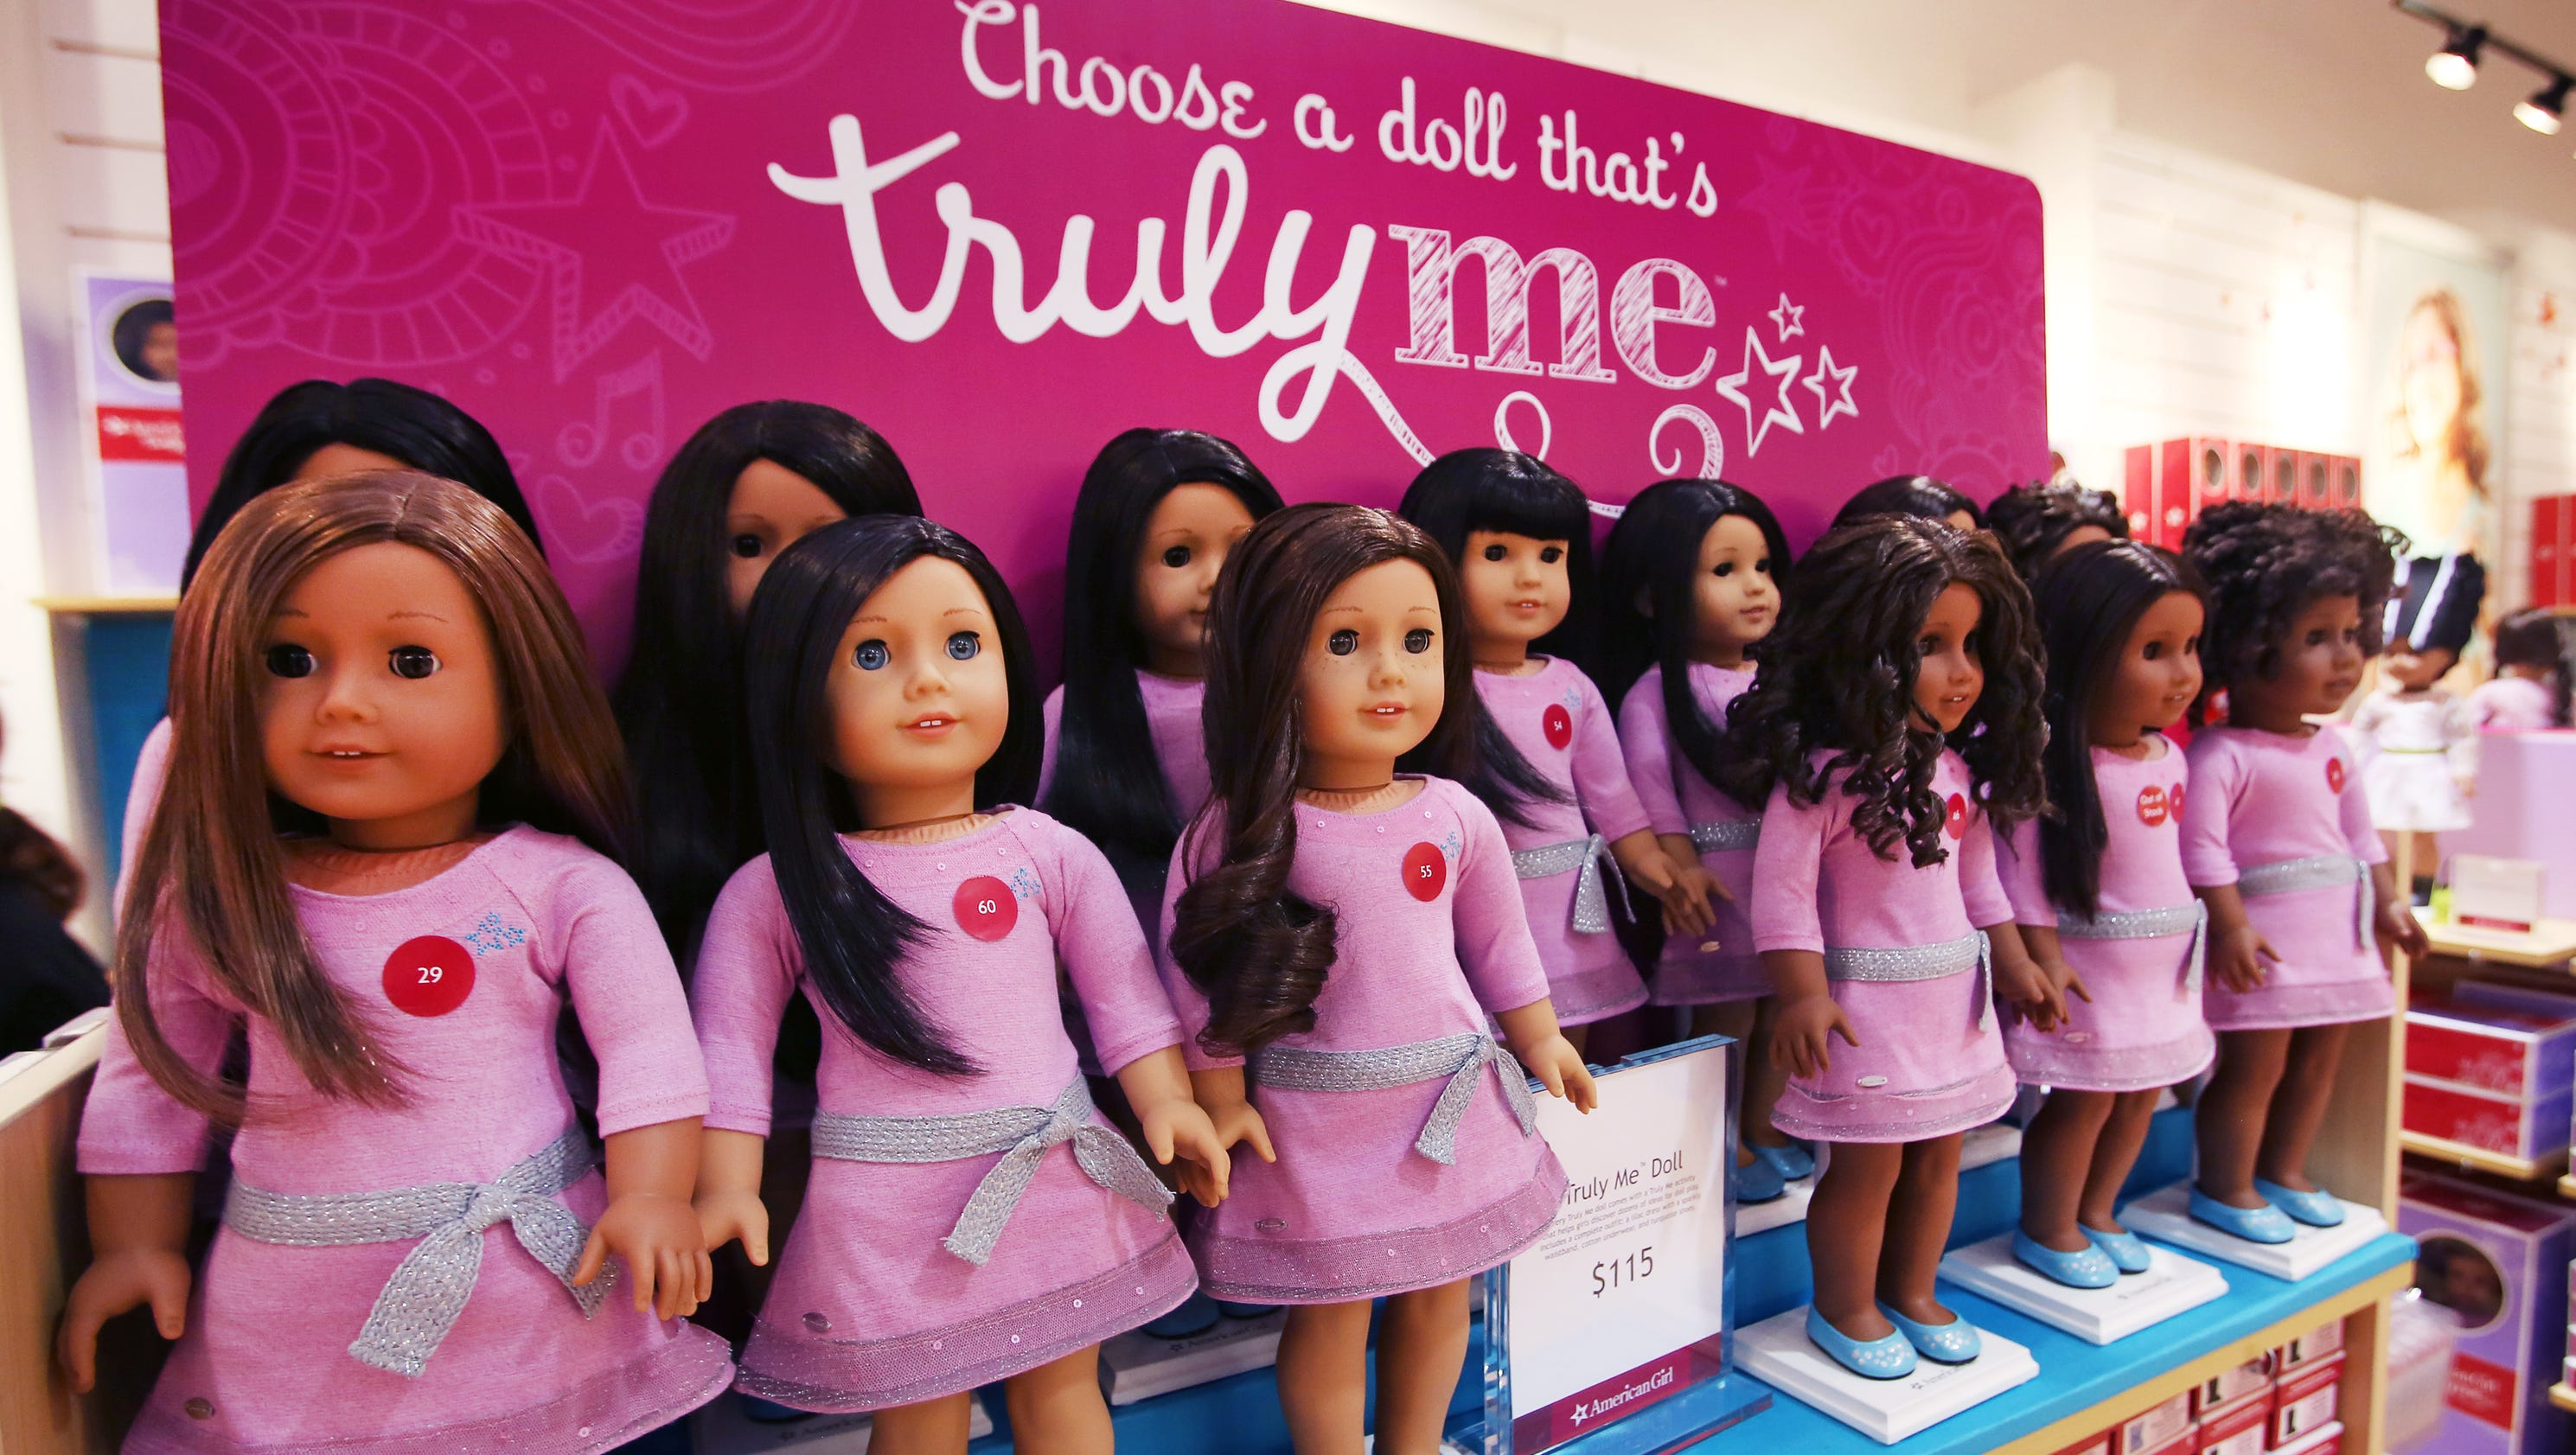 American Girl dolls through the years